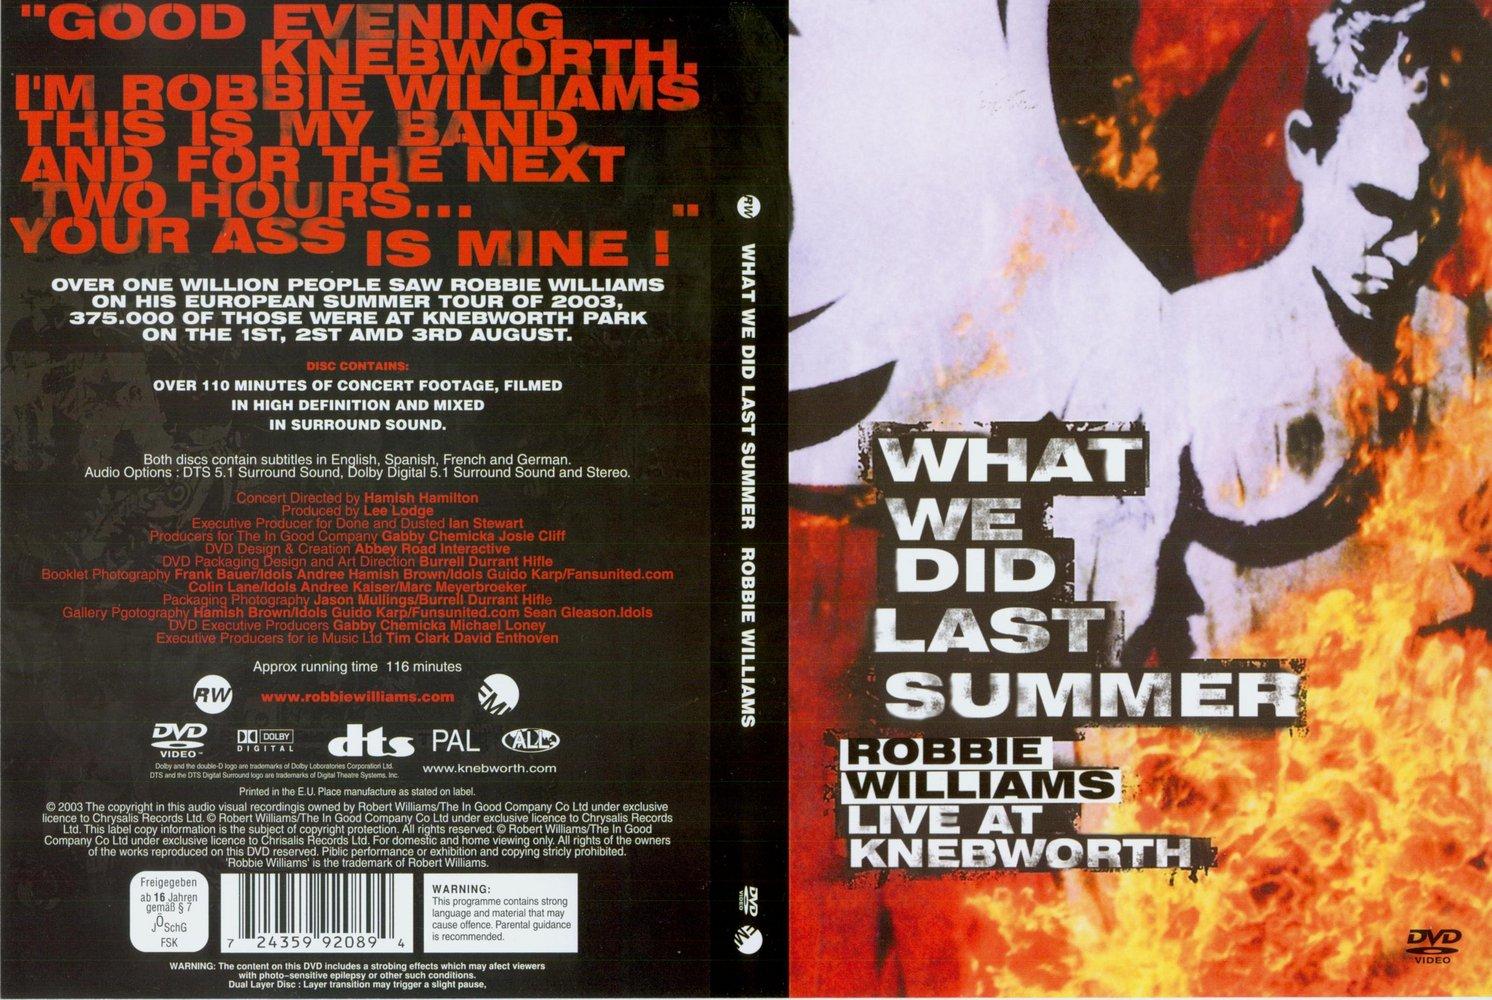 http://2.bp.blogspot.com/-OSxmgOsaSws/Tfnz5aMNVmI/AAAAAAAABIM/sb7PIG-gvXk/s1600/Robbie_Wiliams_Live_At_Knebworth-front.jpg